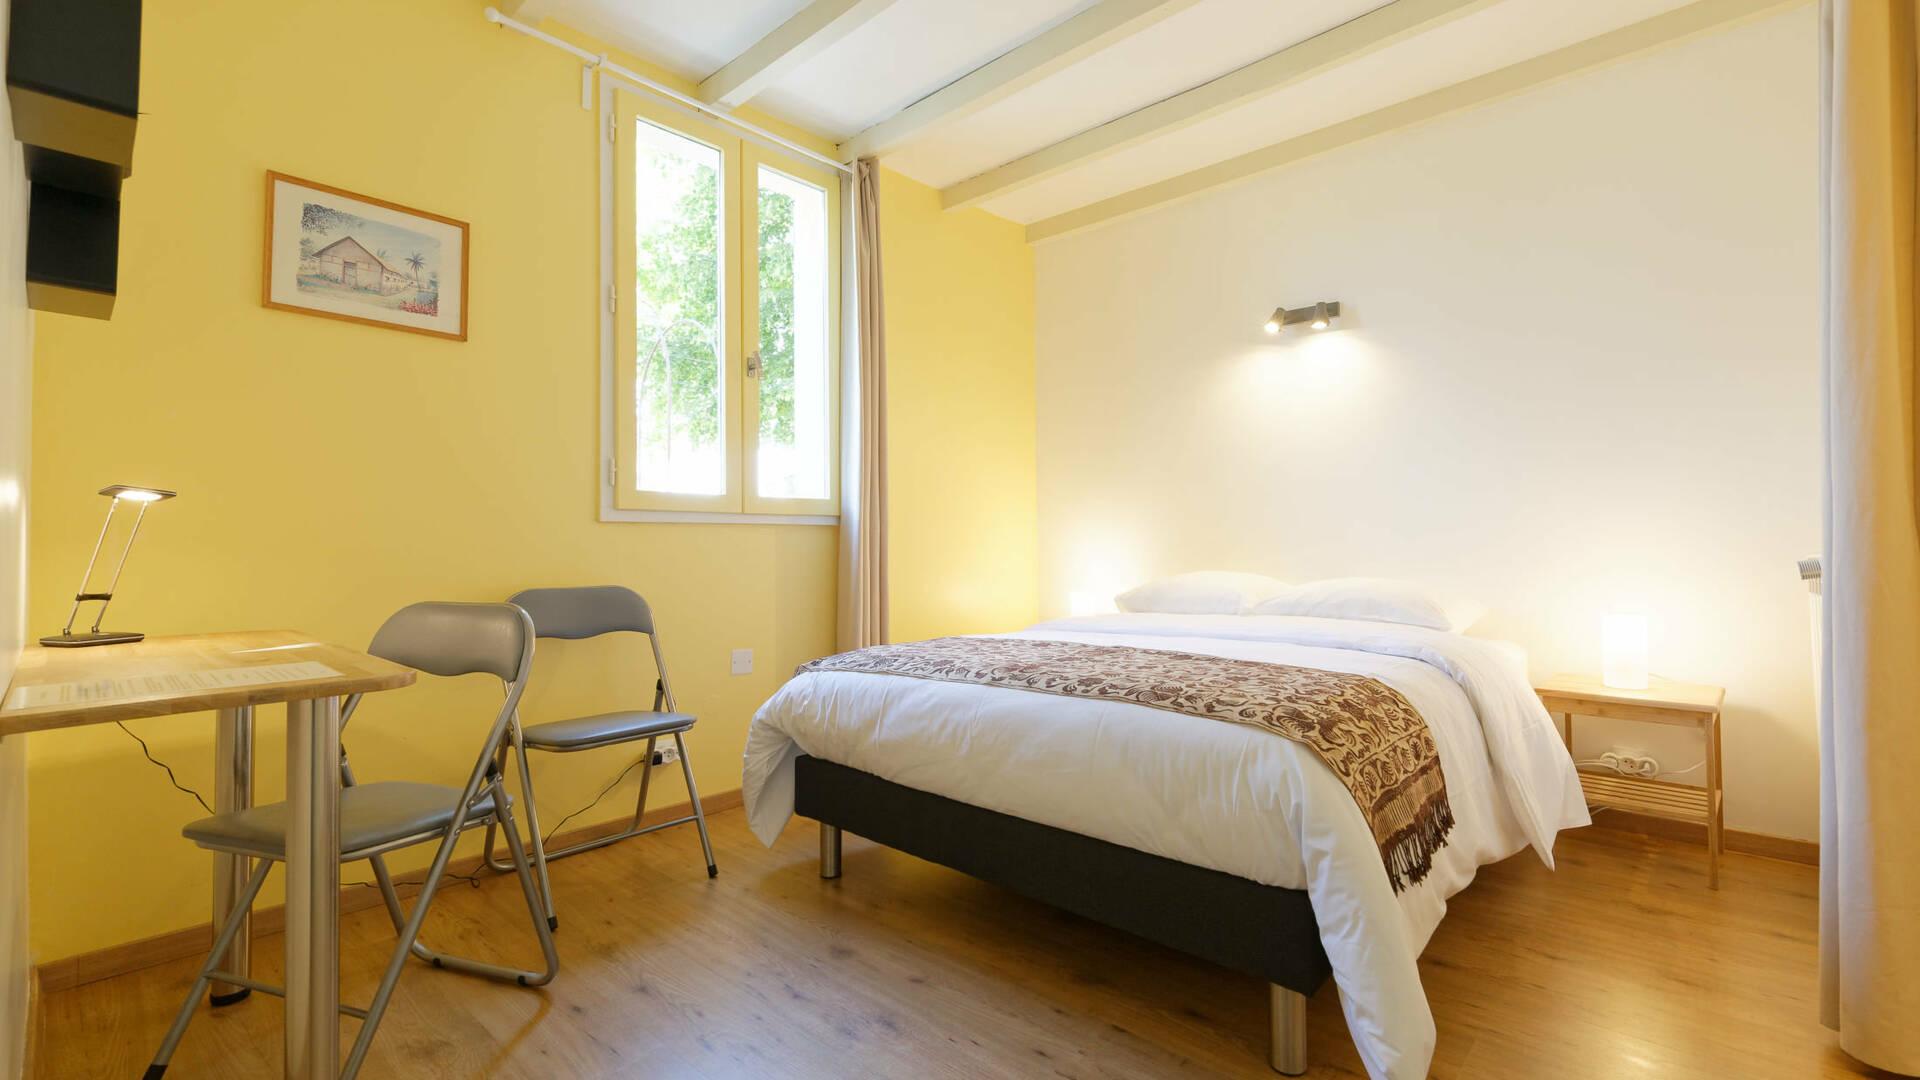 Chambre Rouletabille, Gite La Maison Bleue, Savignac-Mona, Lombez, Samatan, Savès, Gascogne, Gers, France